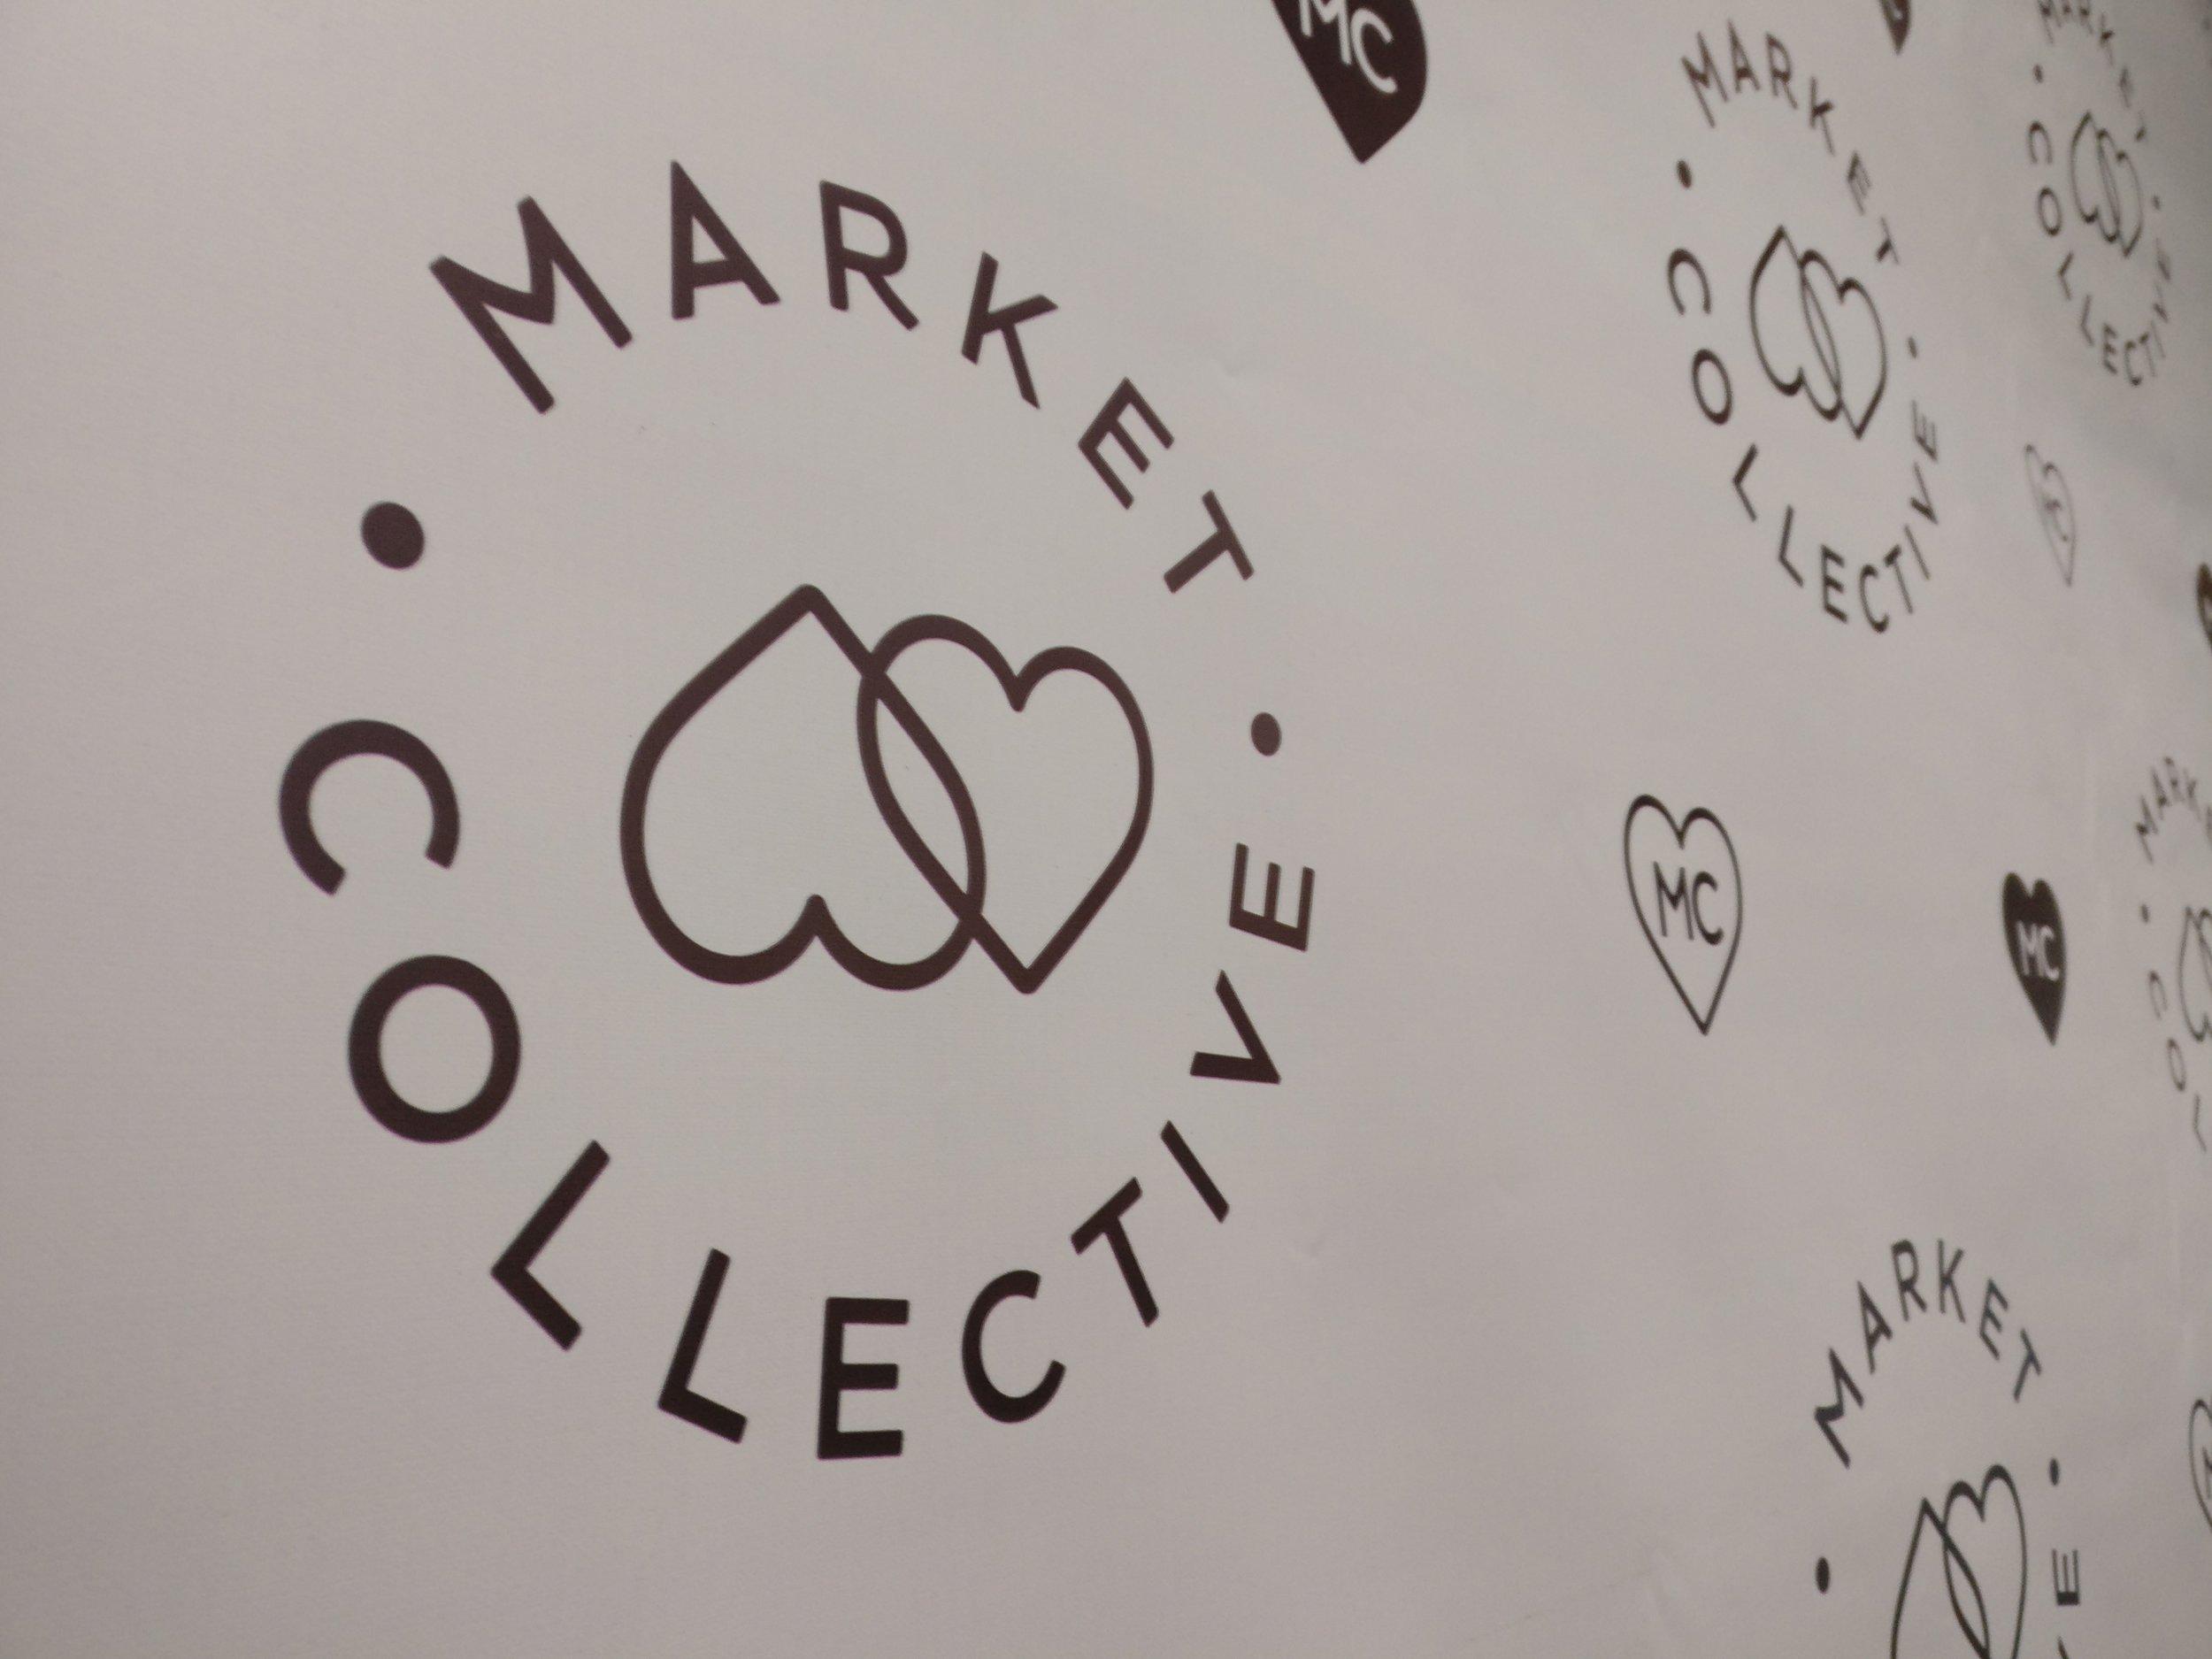 Market Collective - Apr 27 - 29, 2018